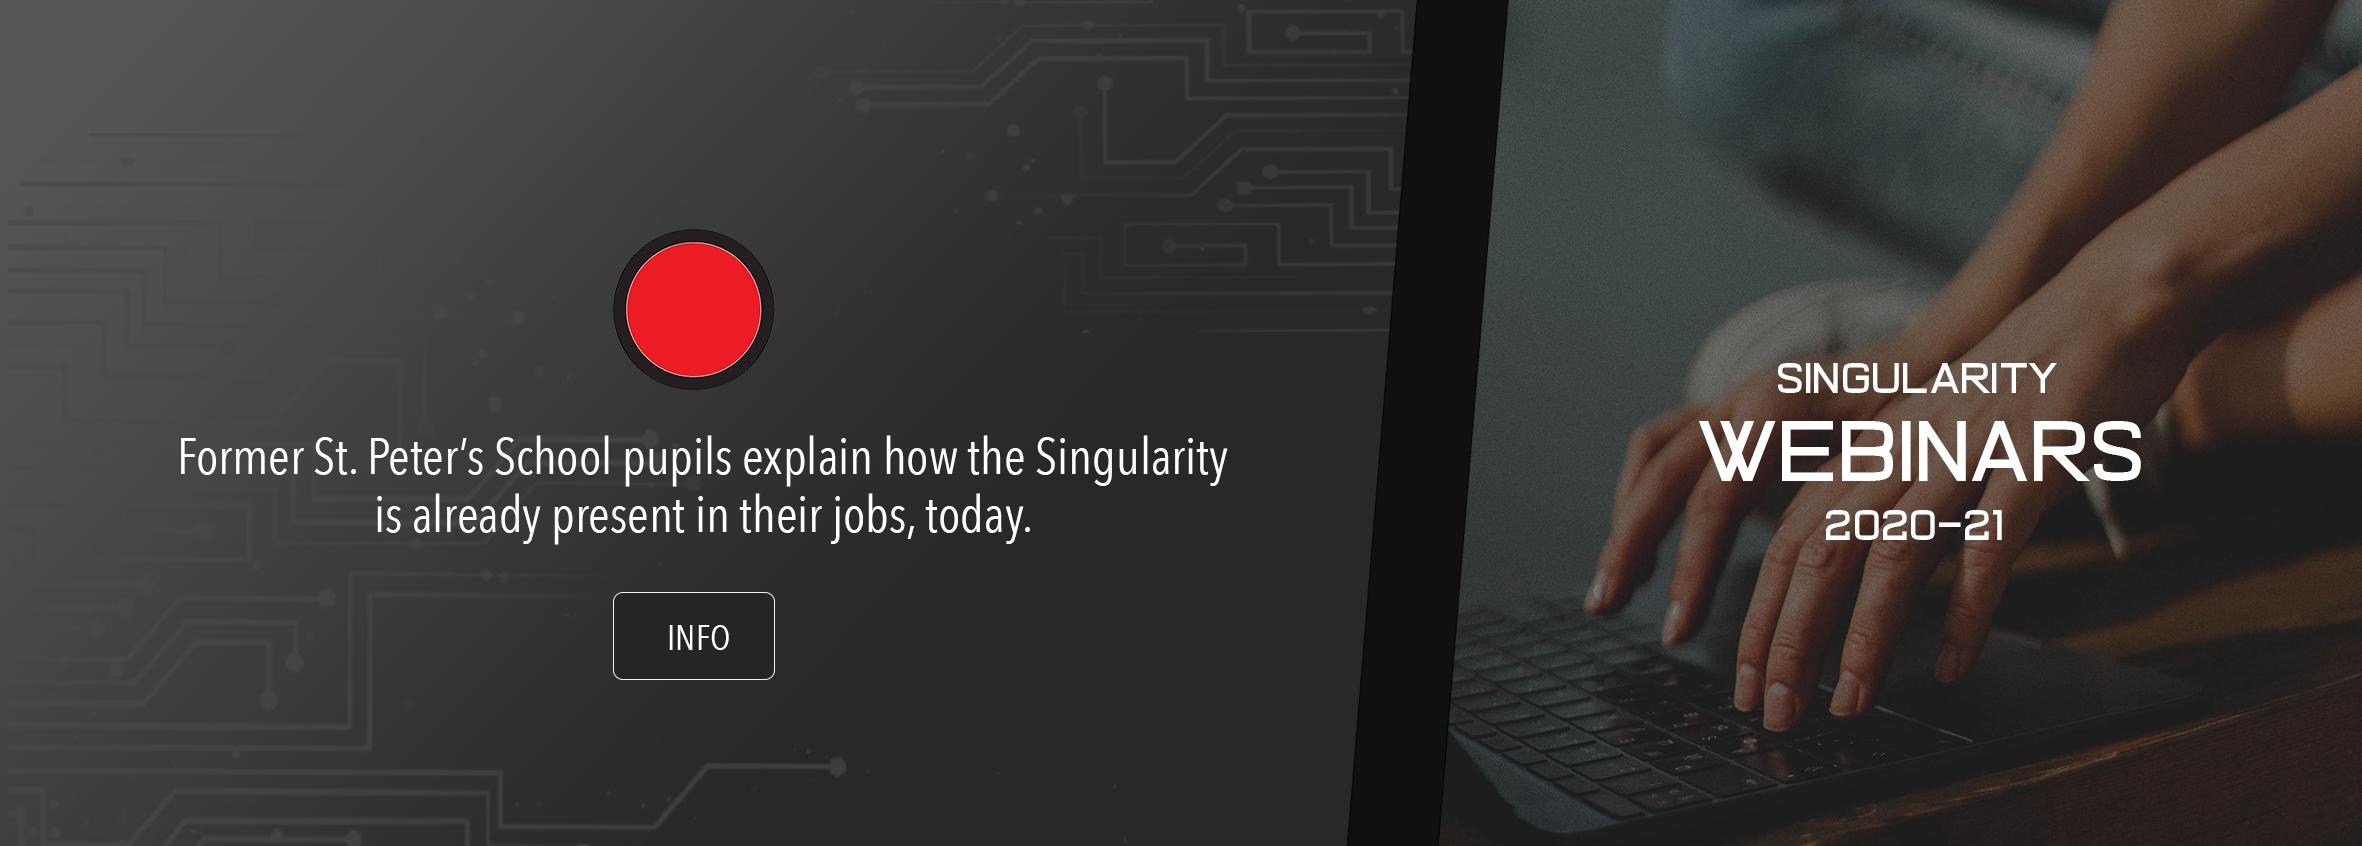 Singularity Webinars